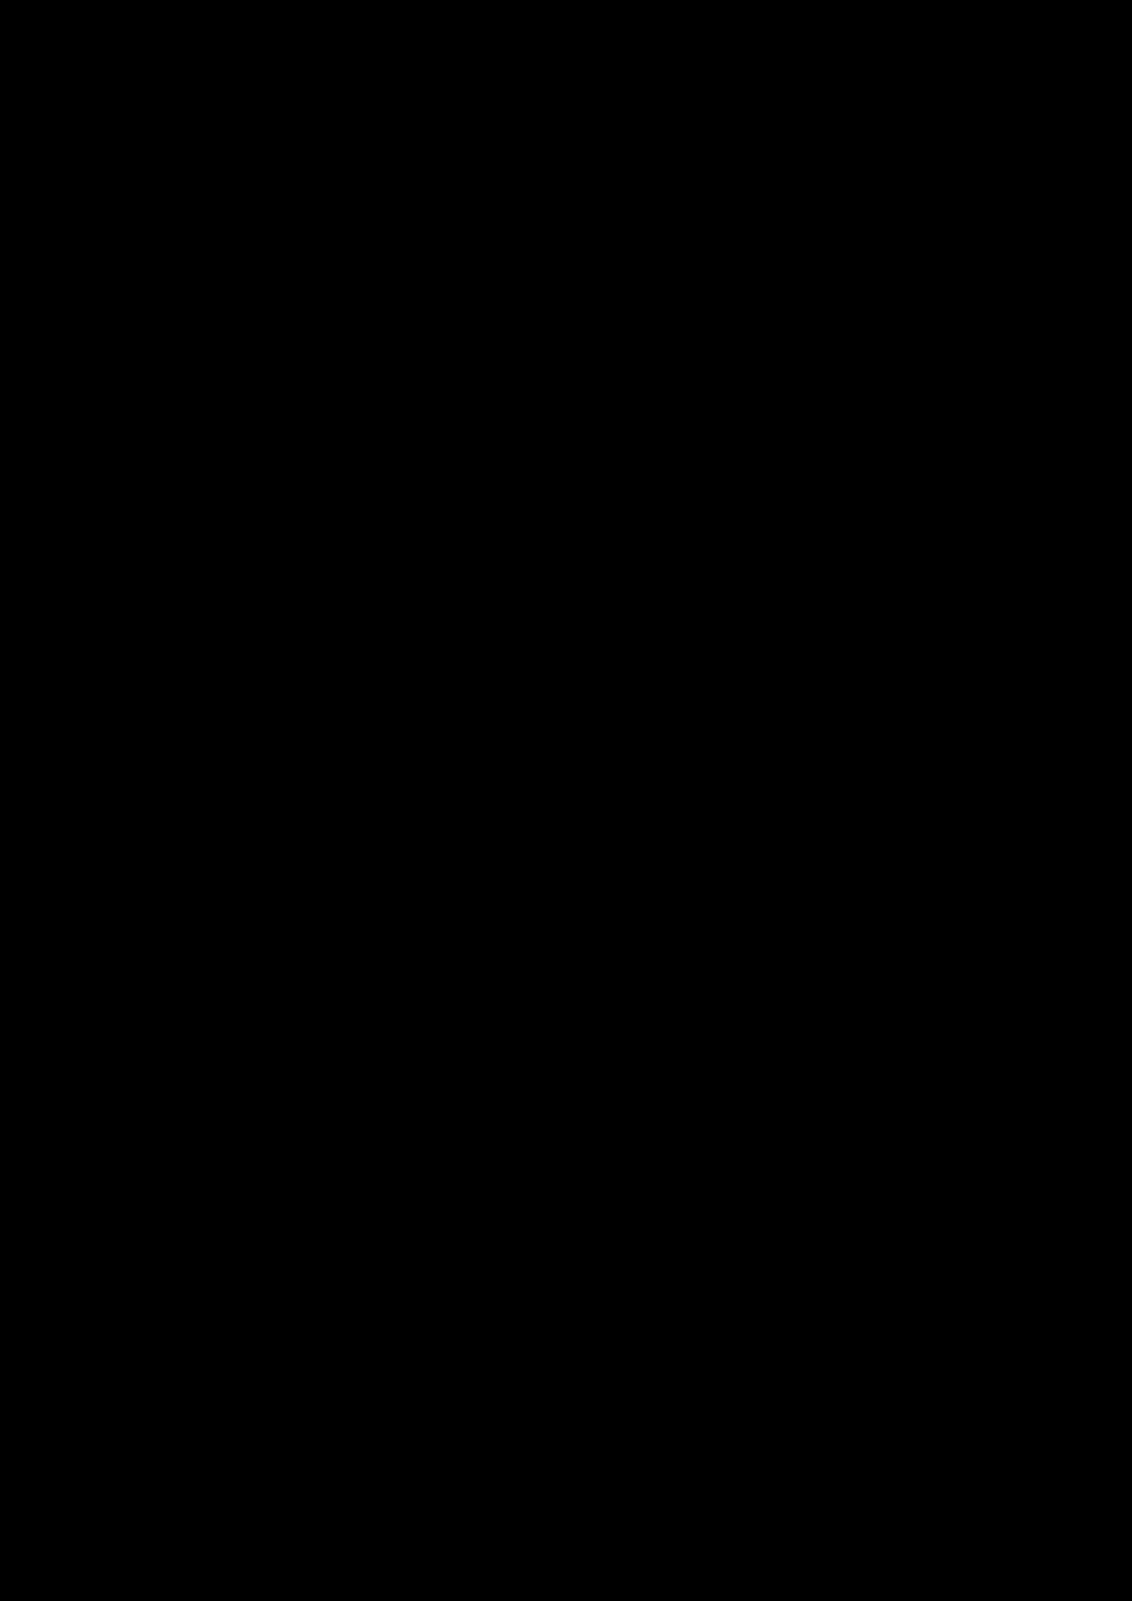 Korolevstvo slez slide, Image 59